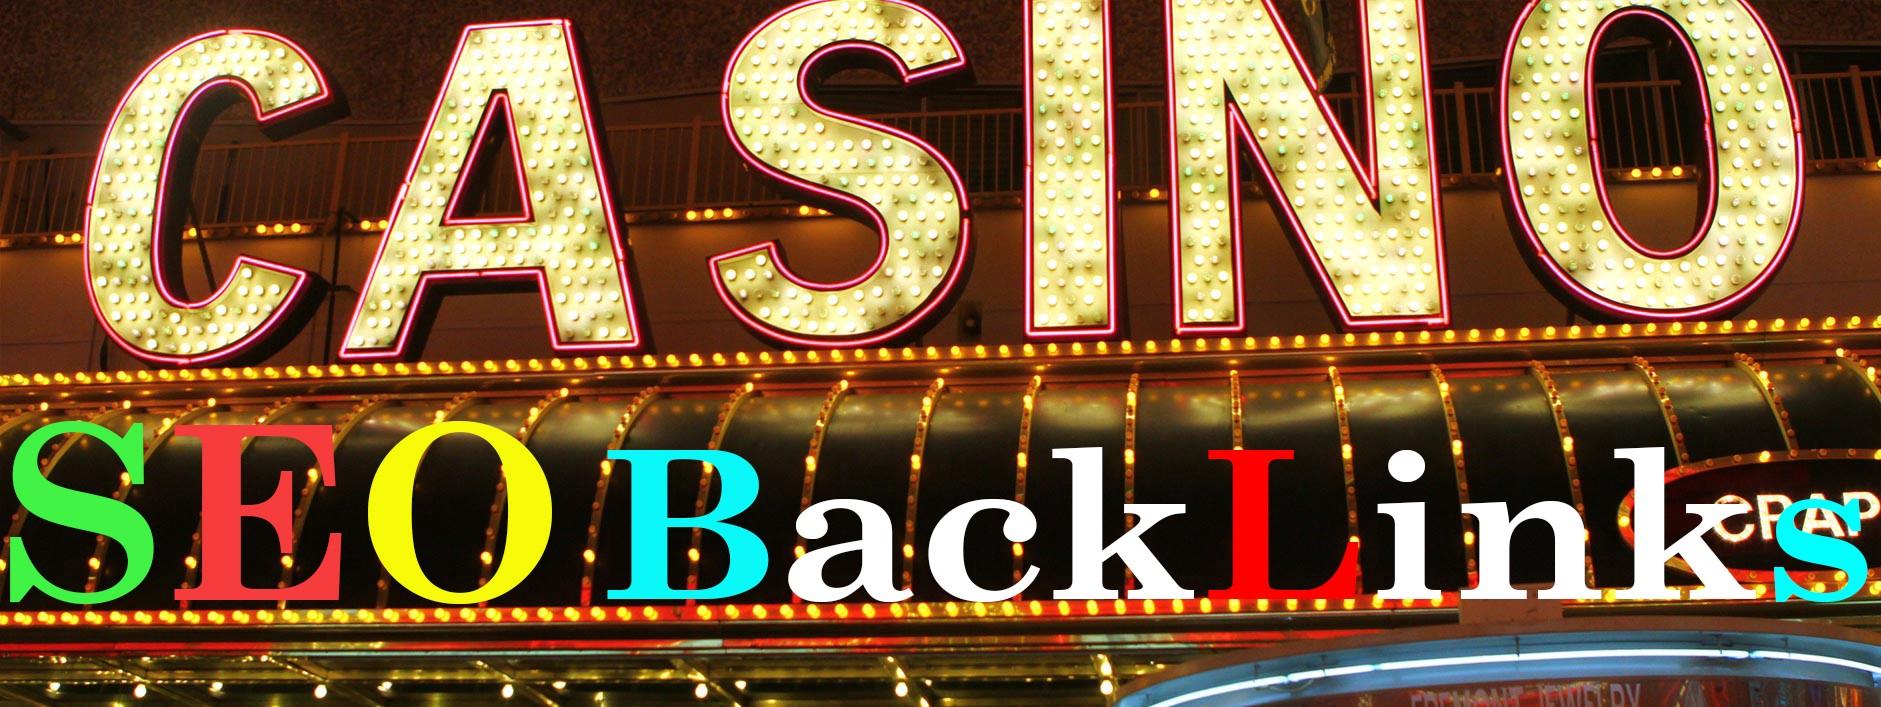 GET 150+ PREMIUM CASINO PBN BACKLINK WITH UNIQUE WEBSITE